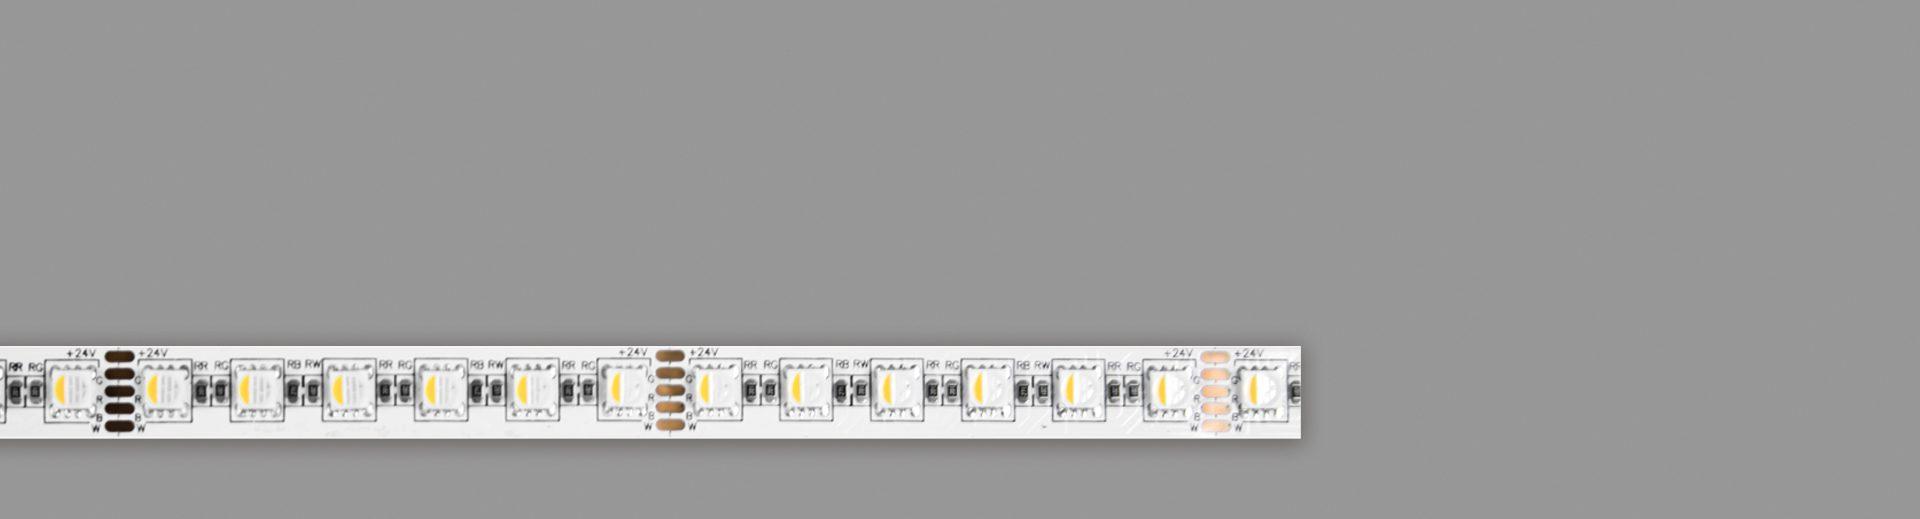 DuraLamp_DT RGBW_Banner